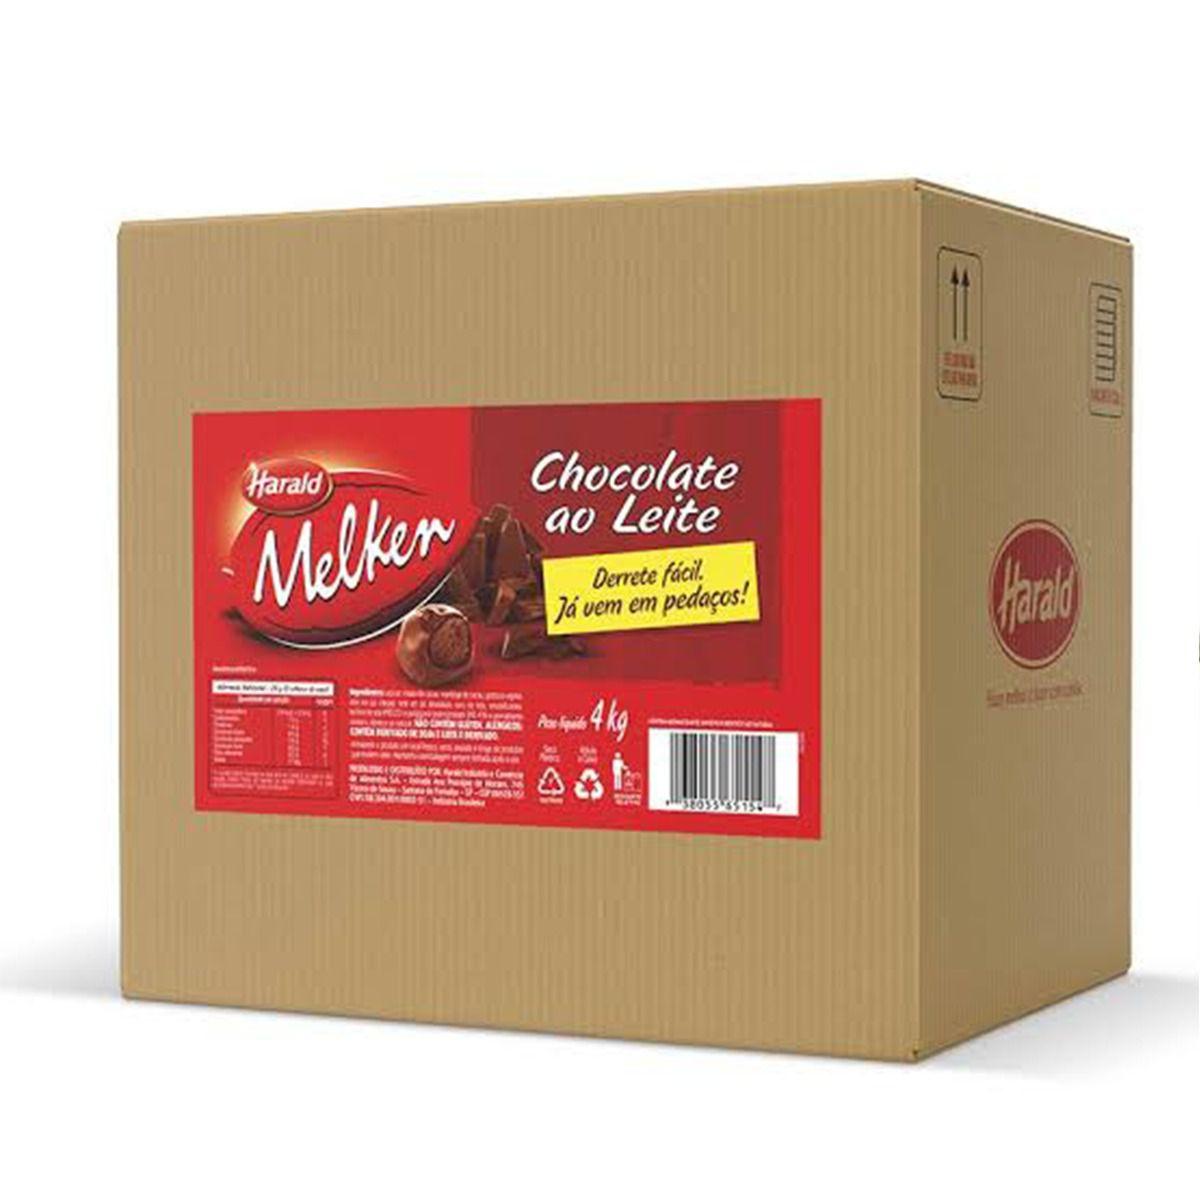 Chocolate Ao Leite Melken Filete 4kg Harald Para Derreter